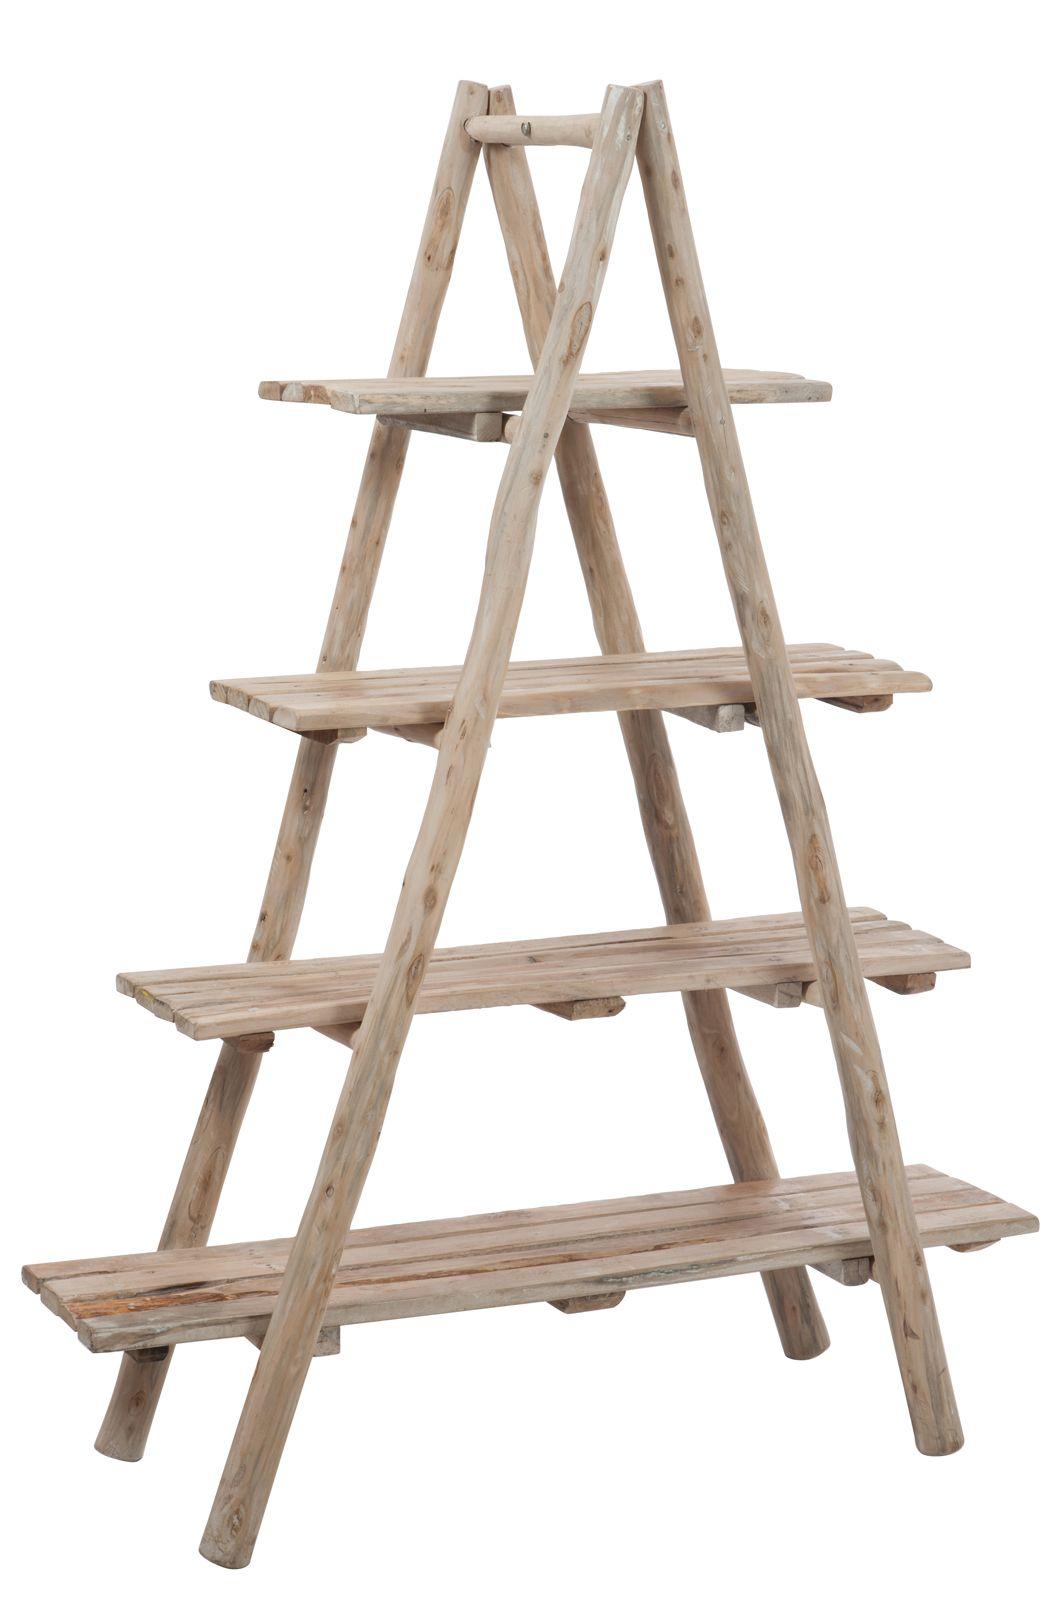 etag re pyramide 4 planches en bois naturel 160x40x120cm biblioth ques tag res ladder. Black Bedroom Furniture Sets. Home Design Ideas